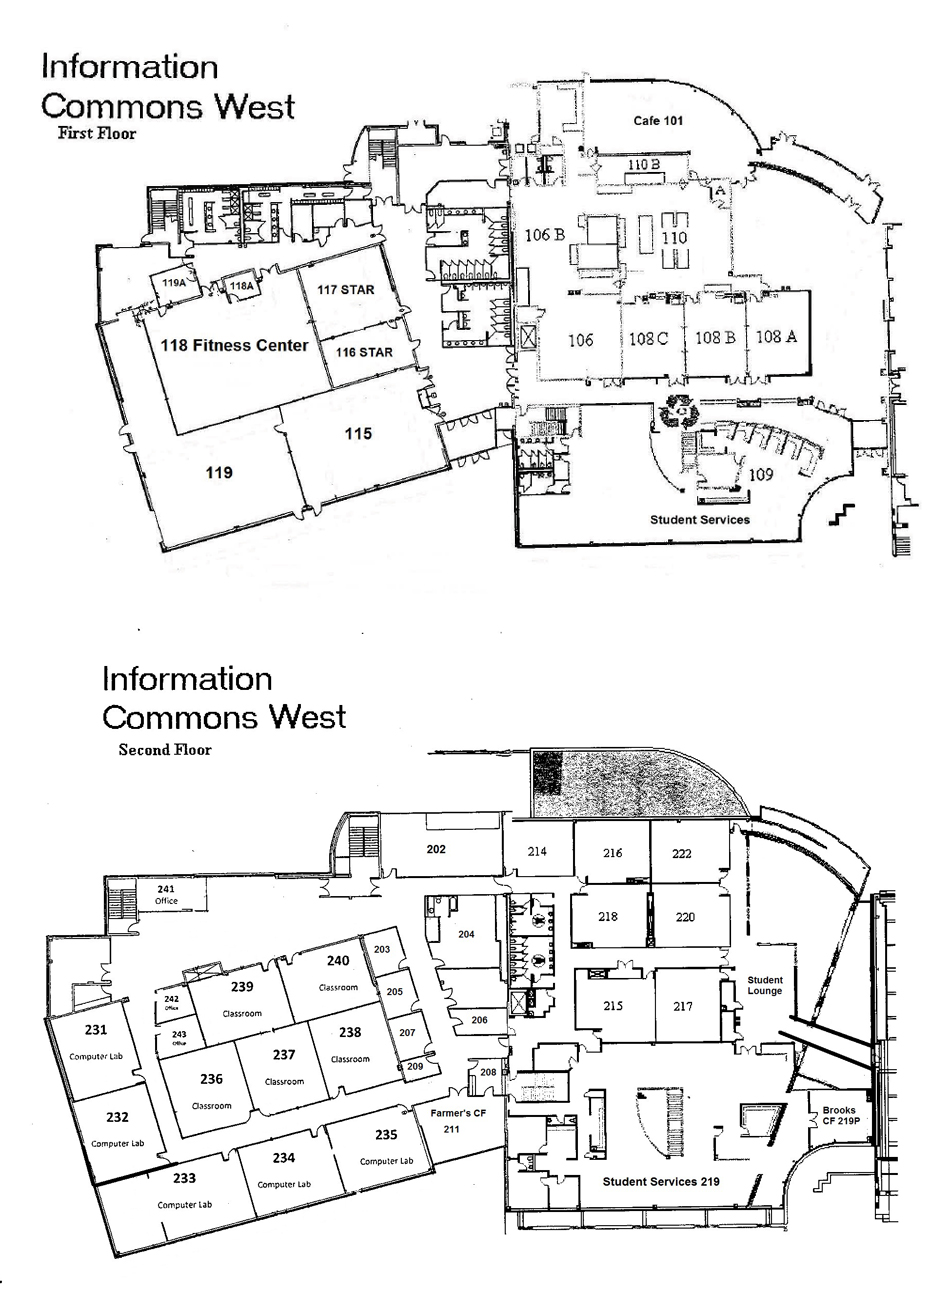 ... Information Commons West Floor Plans ...